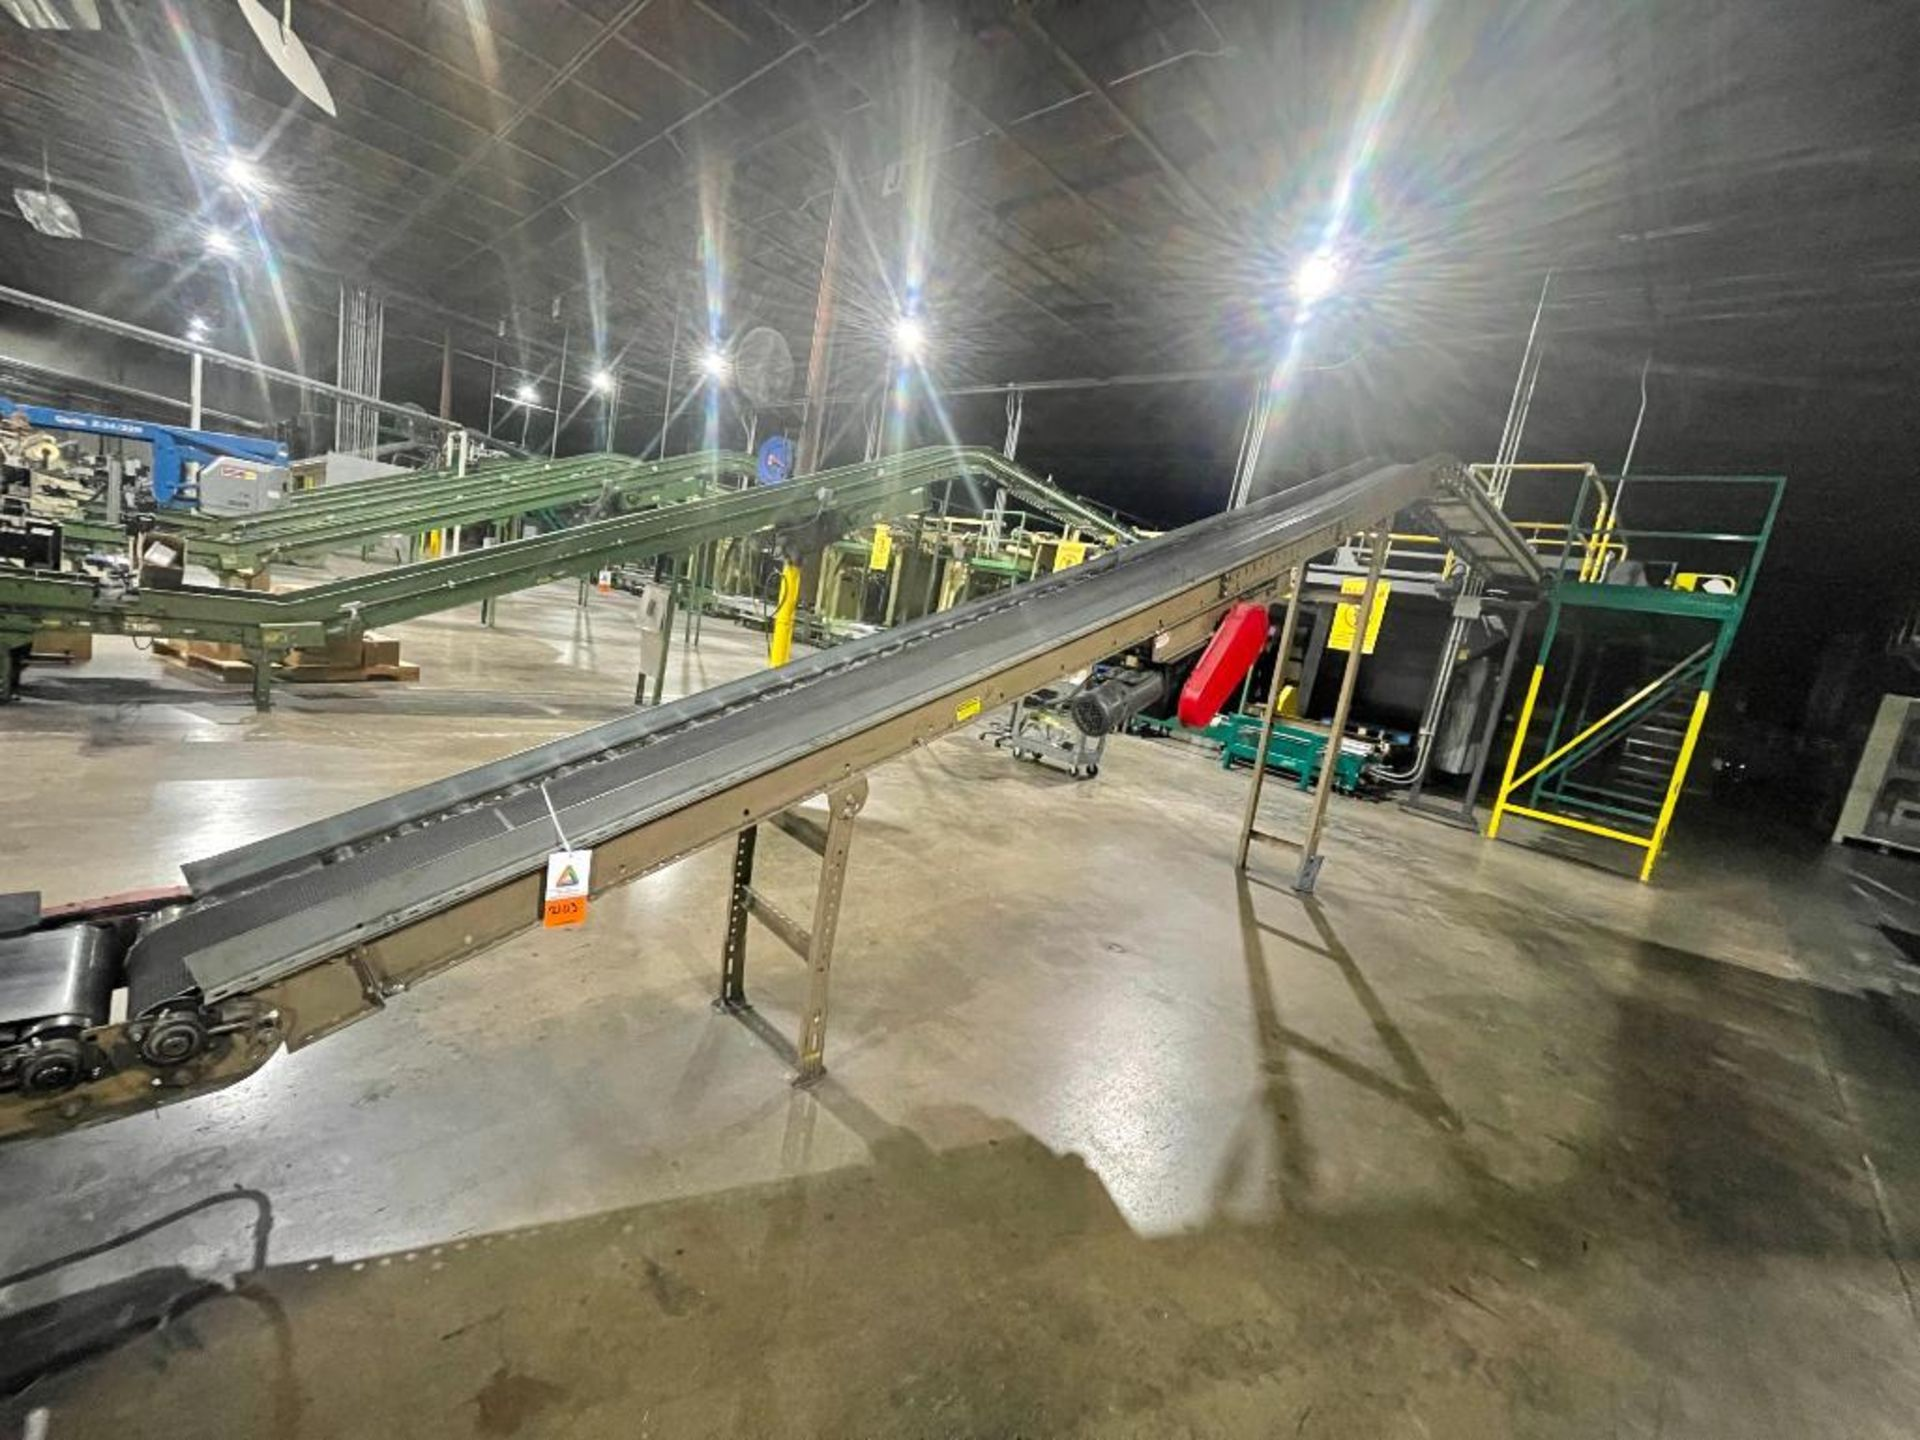 Mathews mild steel incline conveyor - Image 9 of 10